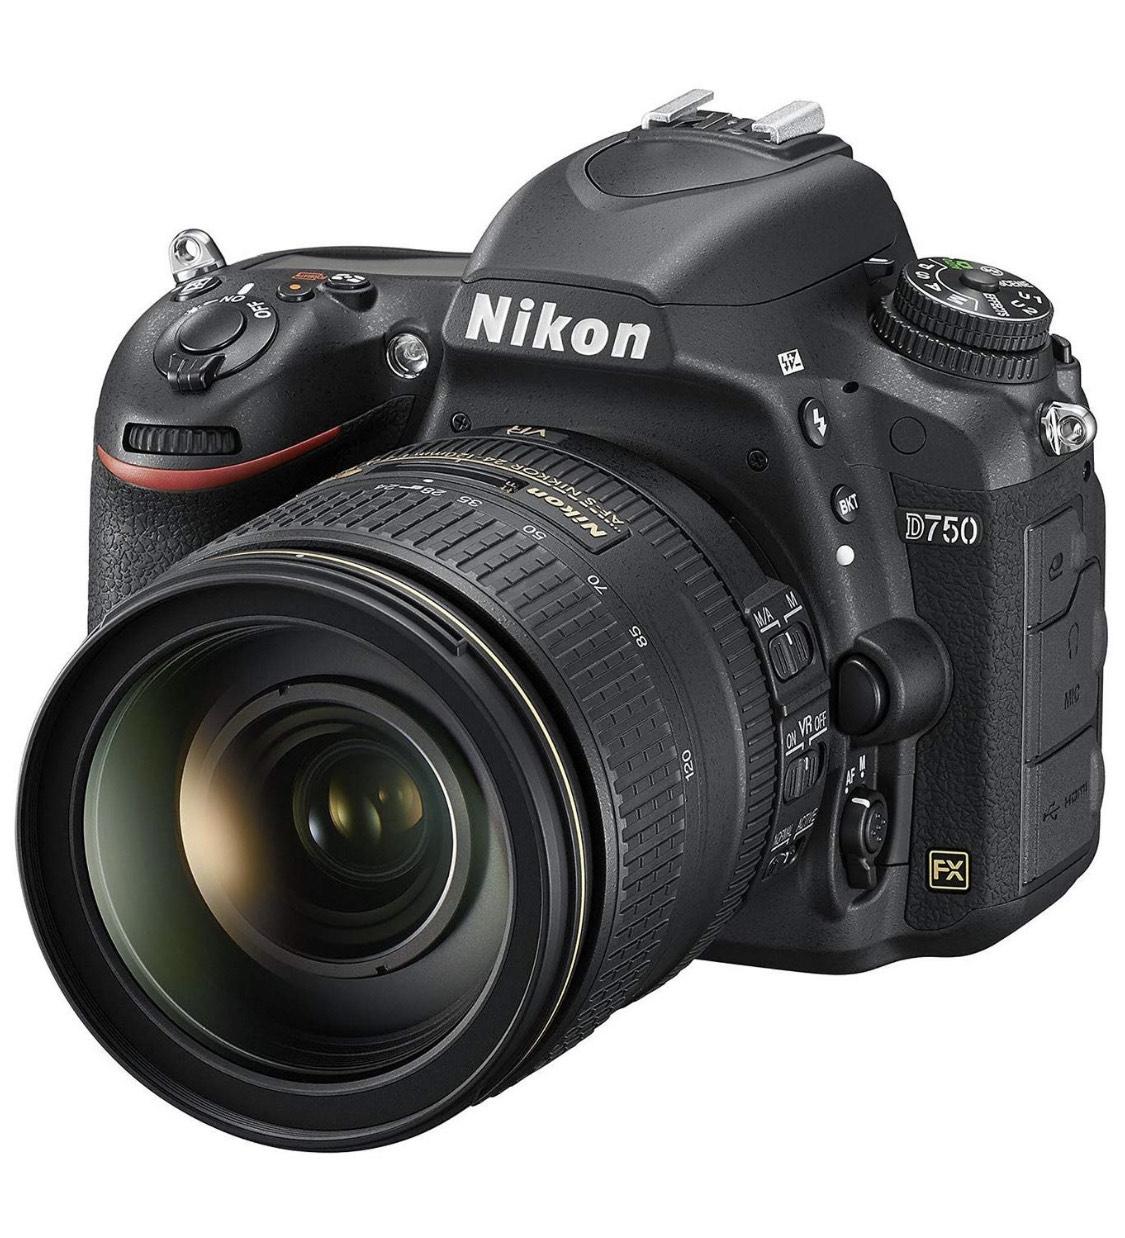 Amazon - Nikon D750 SLR-Digitalkamera (24,3 Megapixel, 8,1 cm (3,2 Zoll) Display, HDMI, USB 2.0) Kit inkl. AF-S Nikkor 24-120 mm 1:4G ED VR